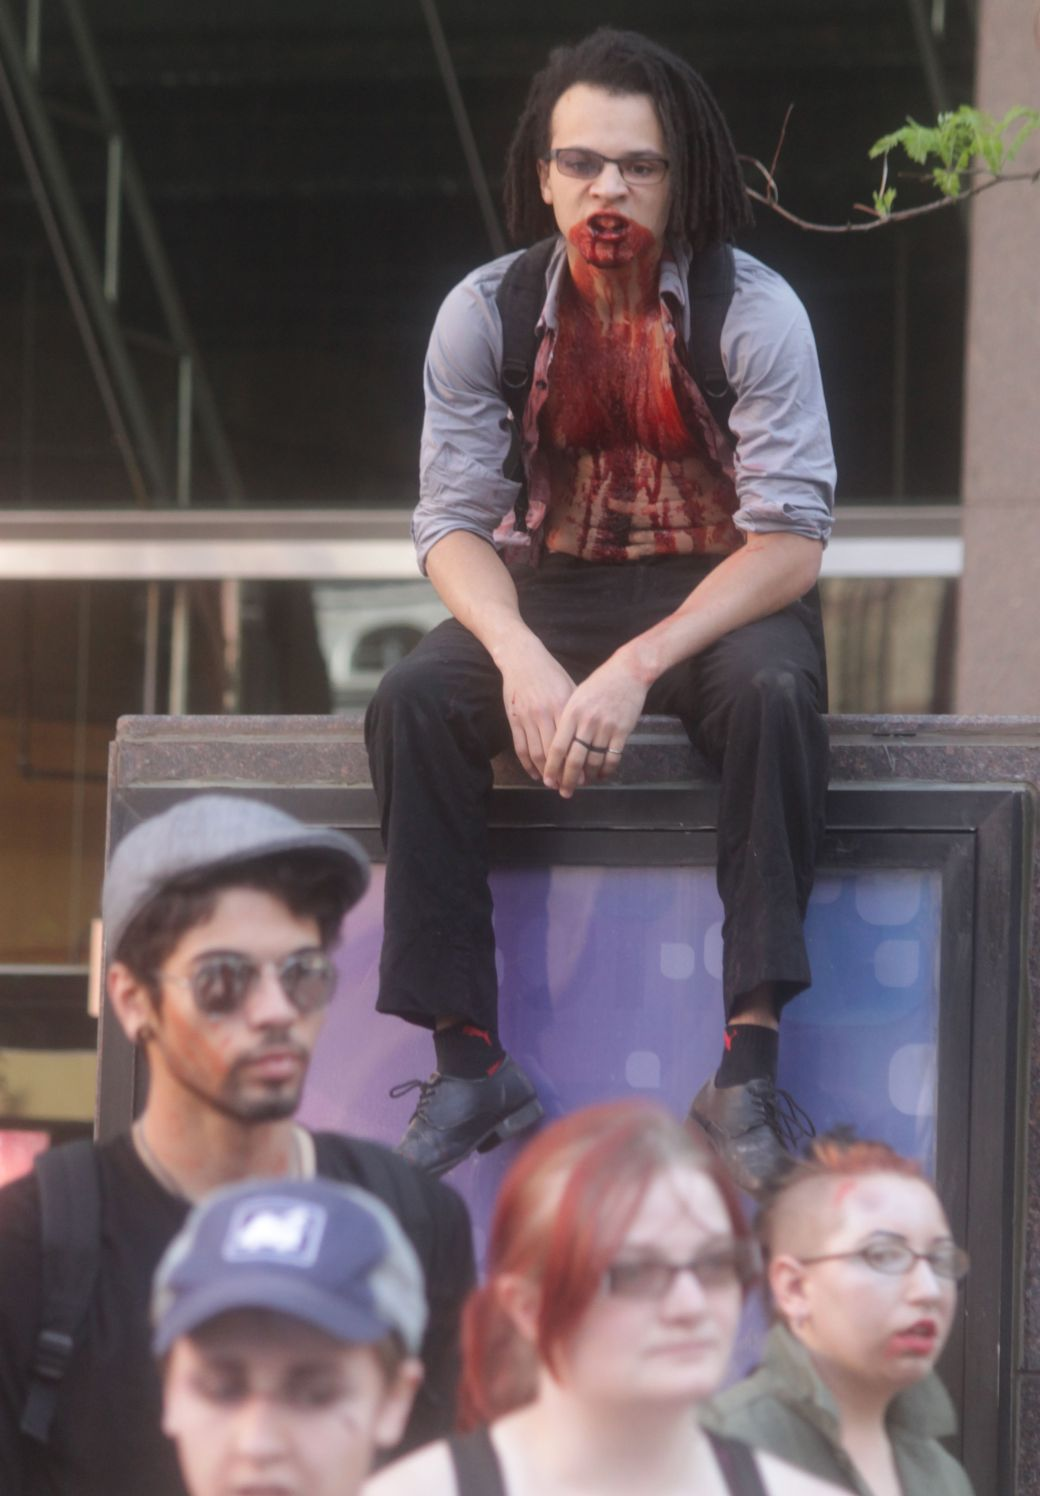 boston zombie walk may 17 3